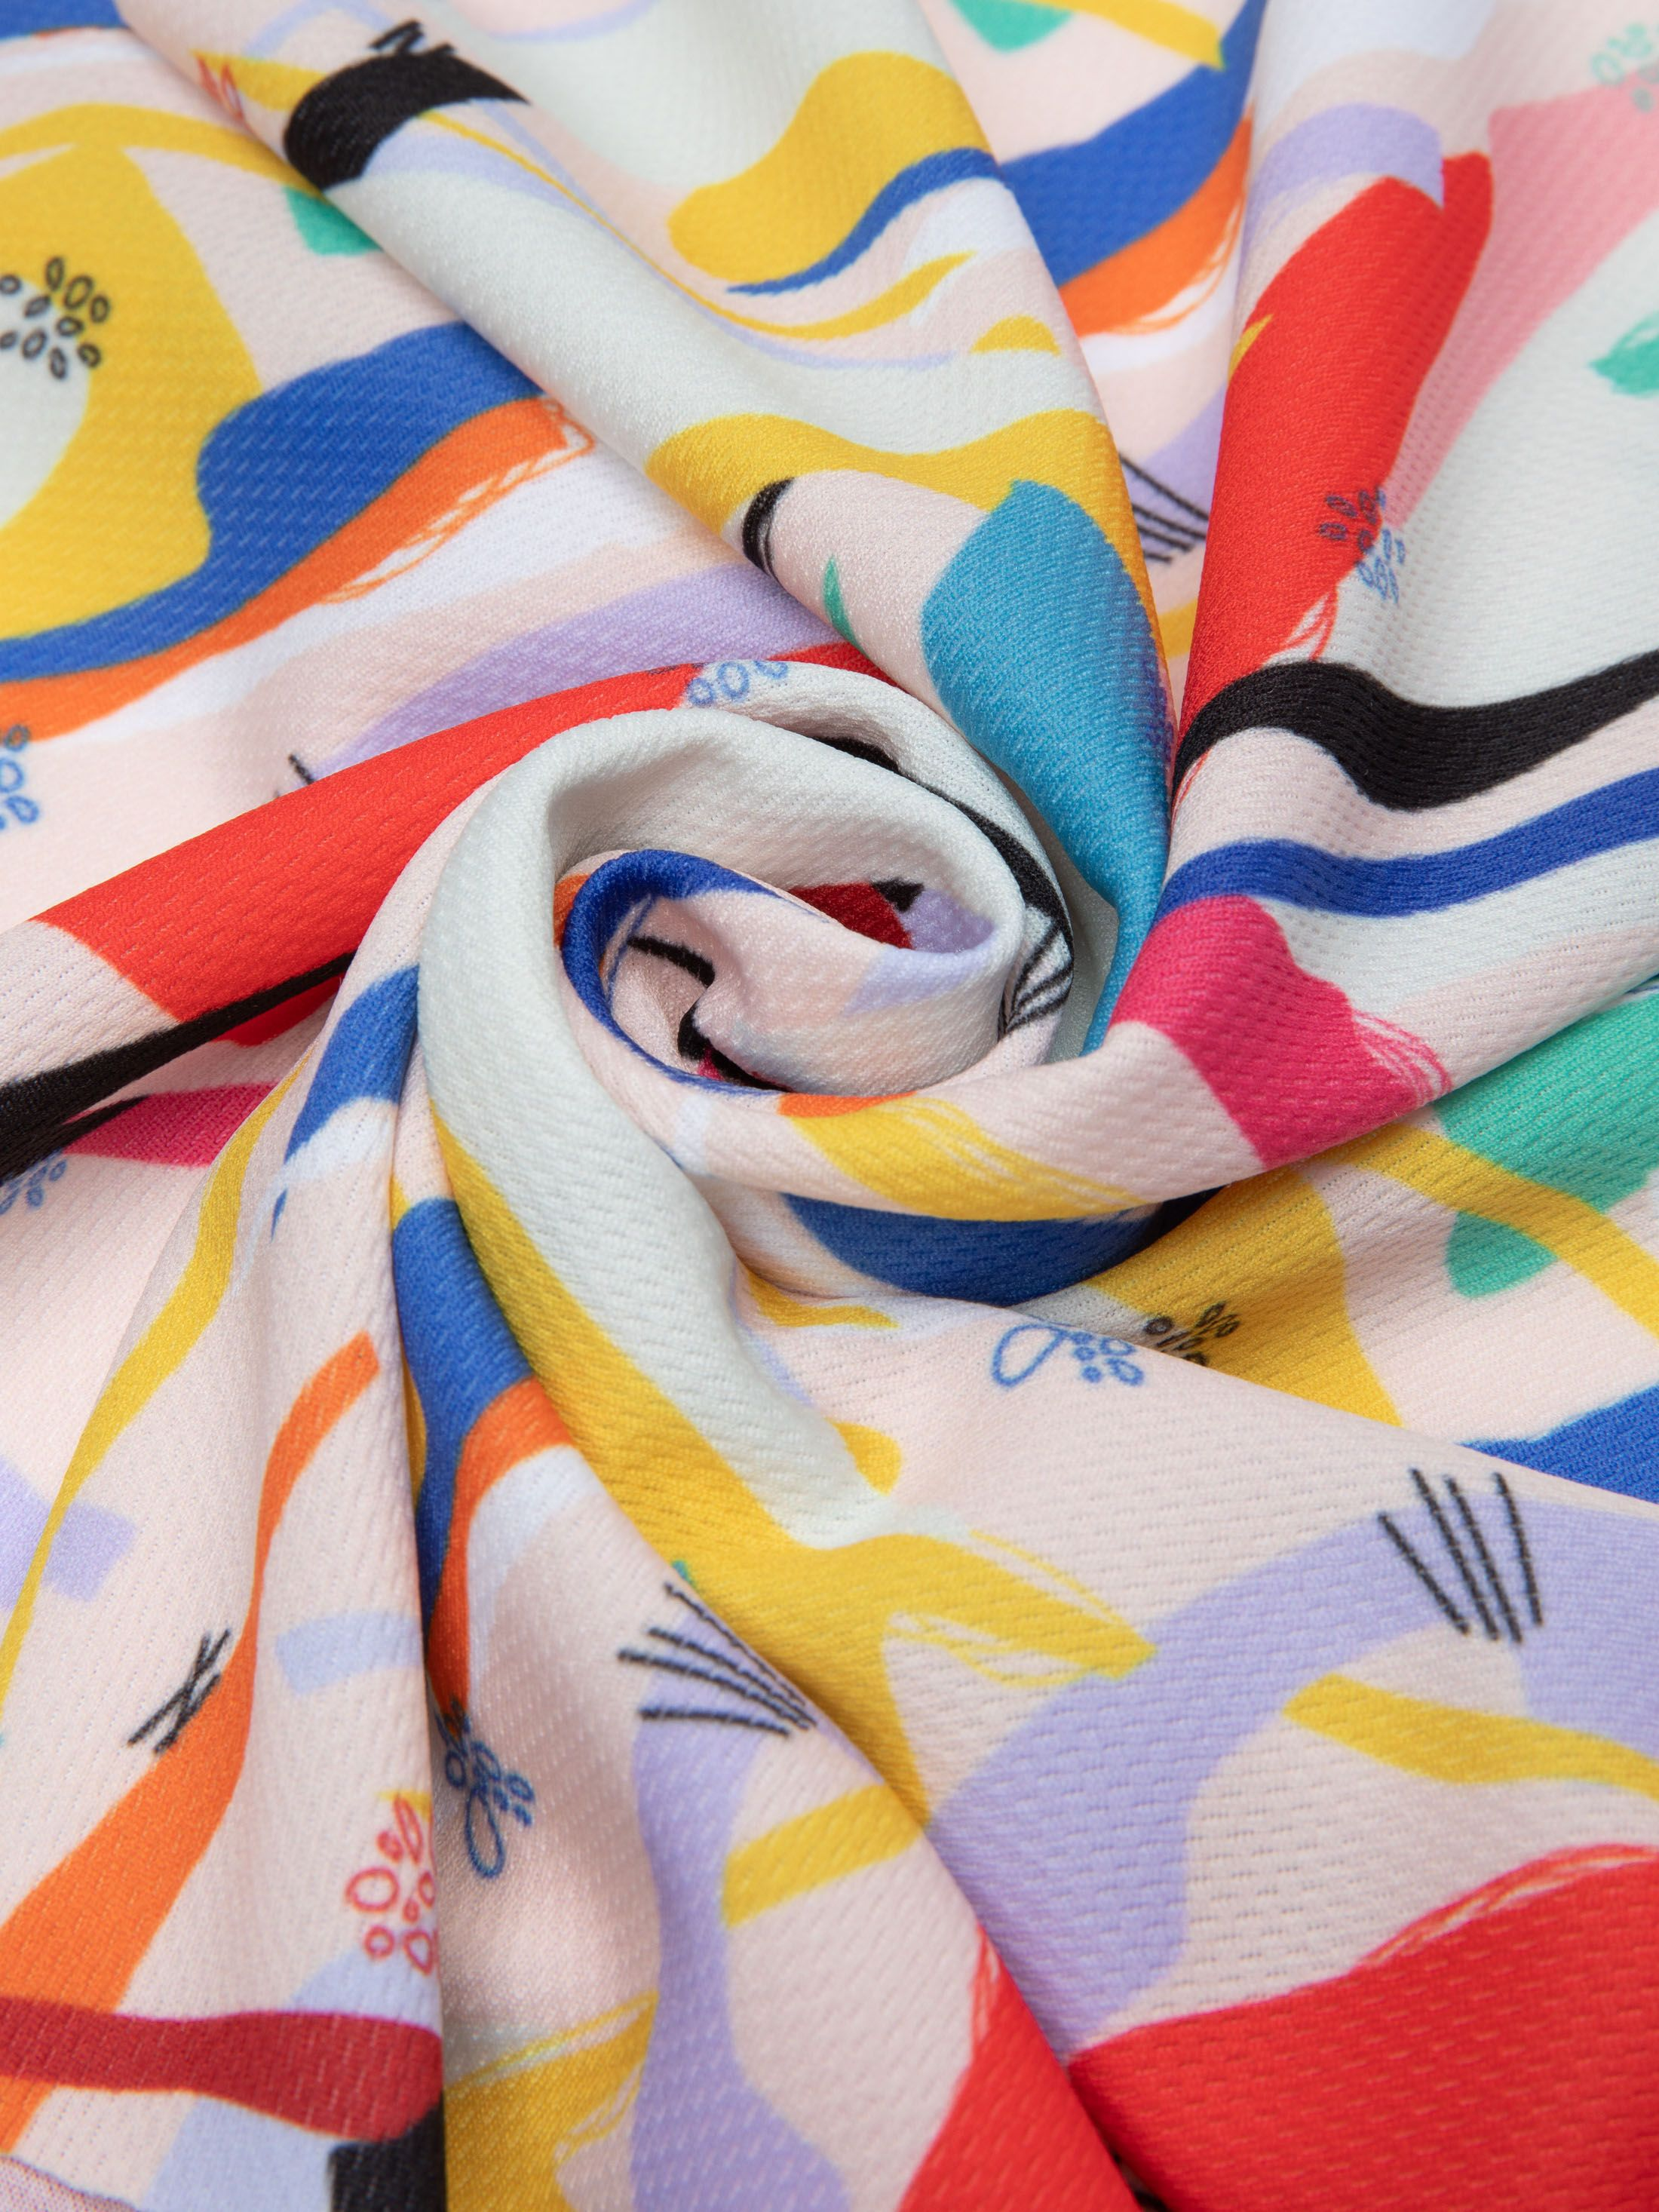 Designa din egna textil airflow